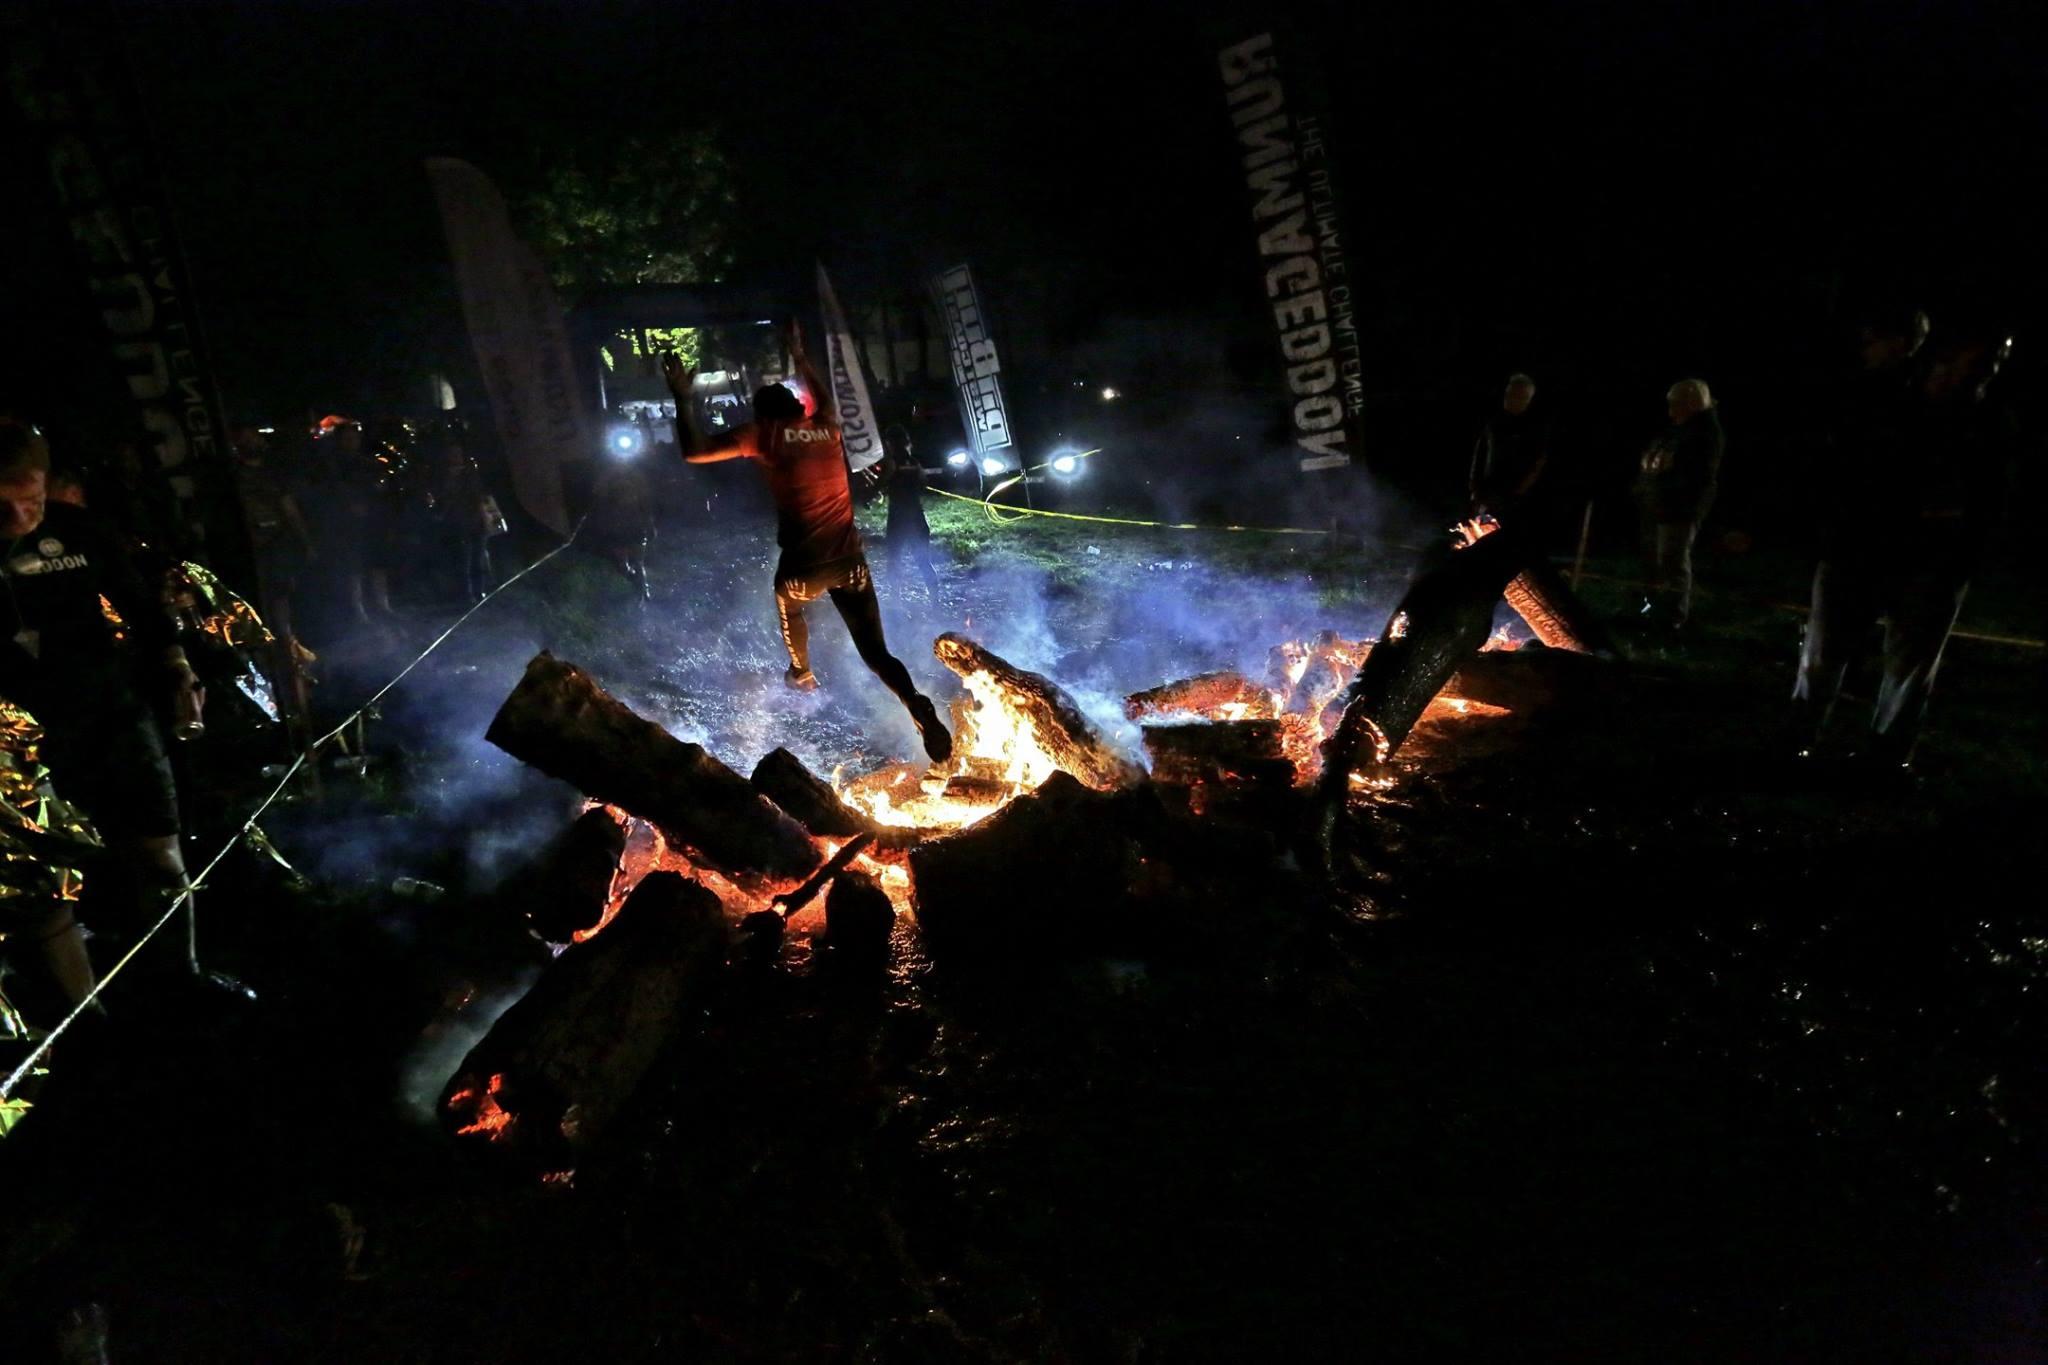 Runmageddon Rekrut Nocny Modlin 2016 zdjęcia, foto (5)